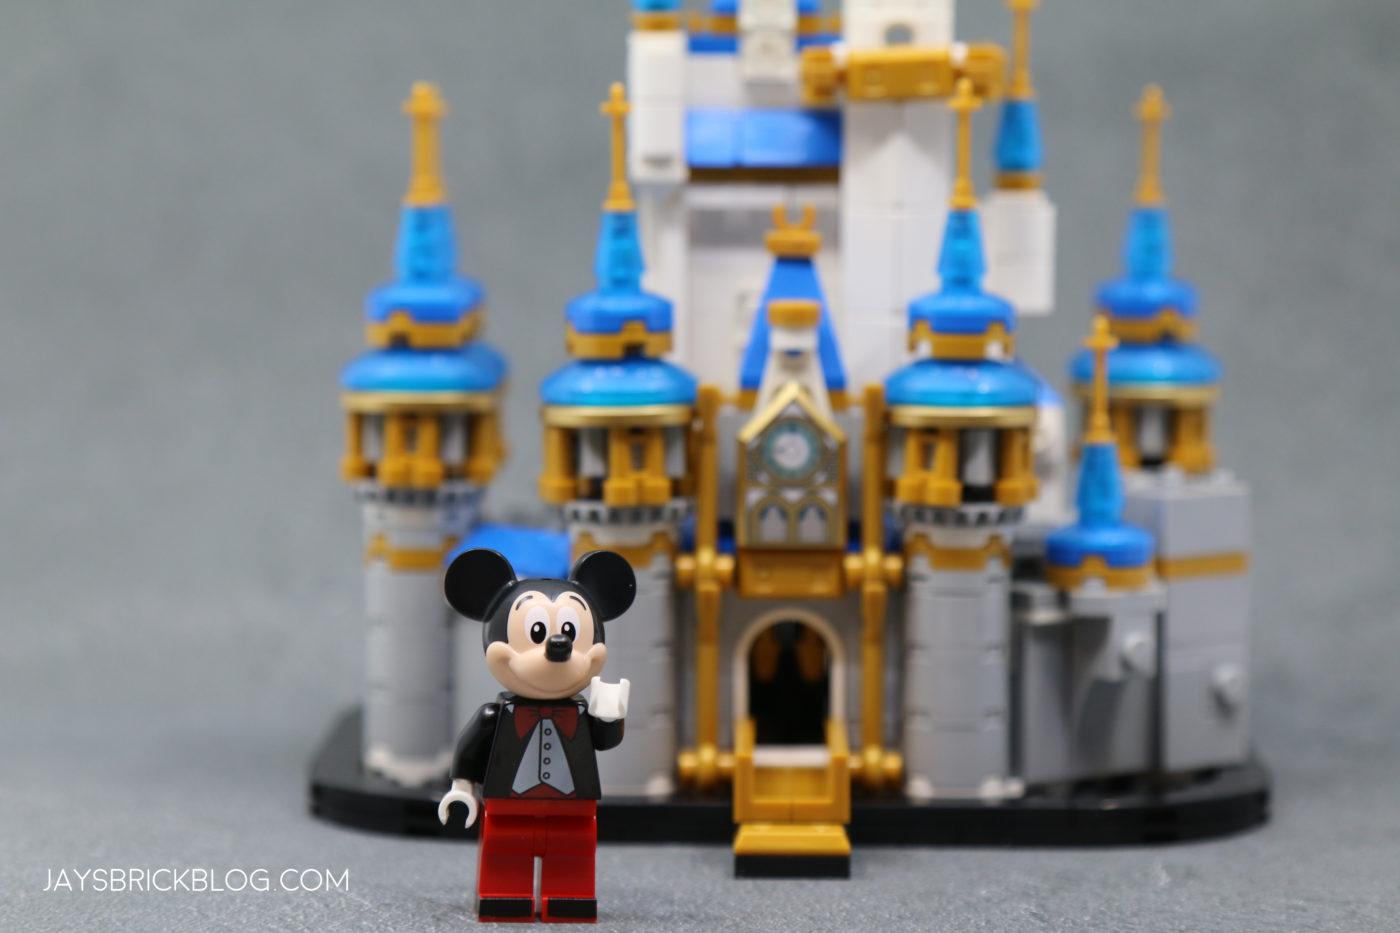 LEGO 40478 Mini Disney Castle Mickey Mouse Minifigure